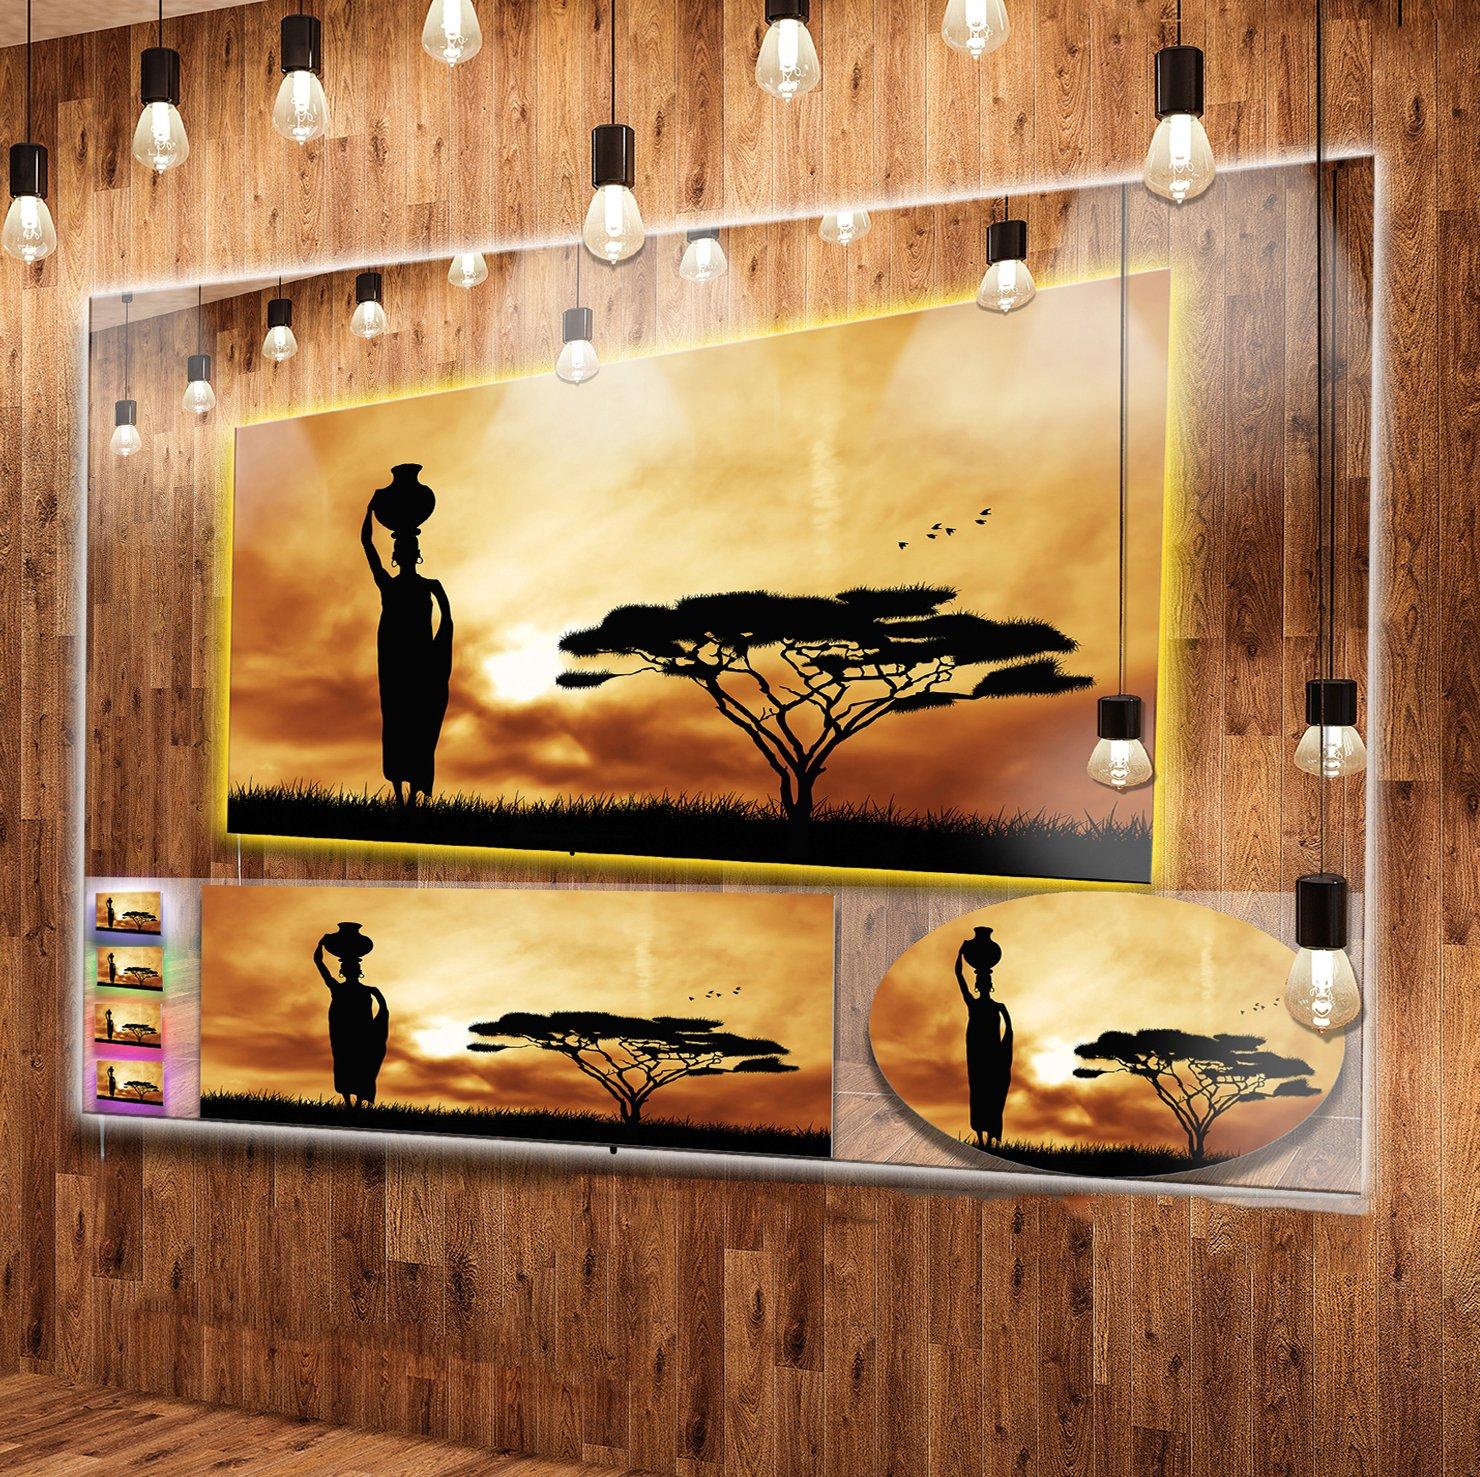 Amazon.com: Designart MT12979-48-40-LED African Woman & Lonely Tree ...